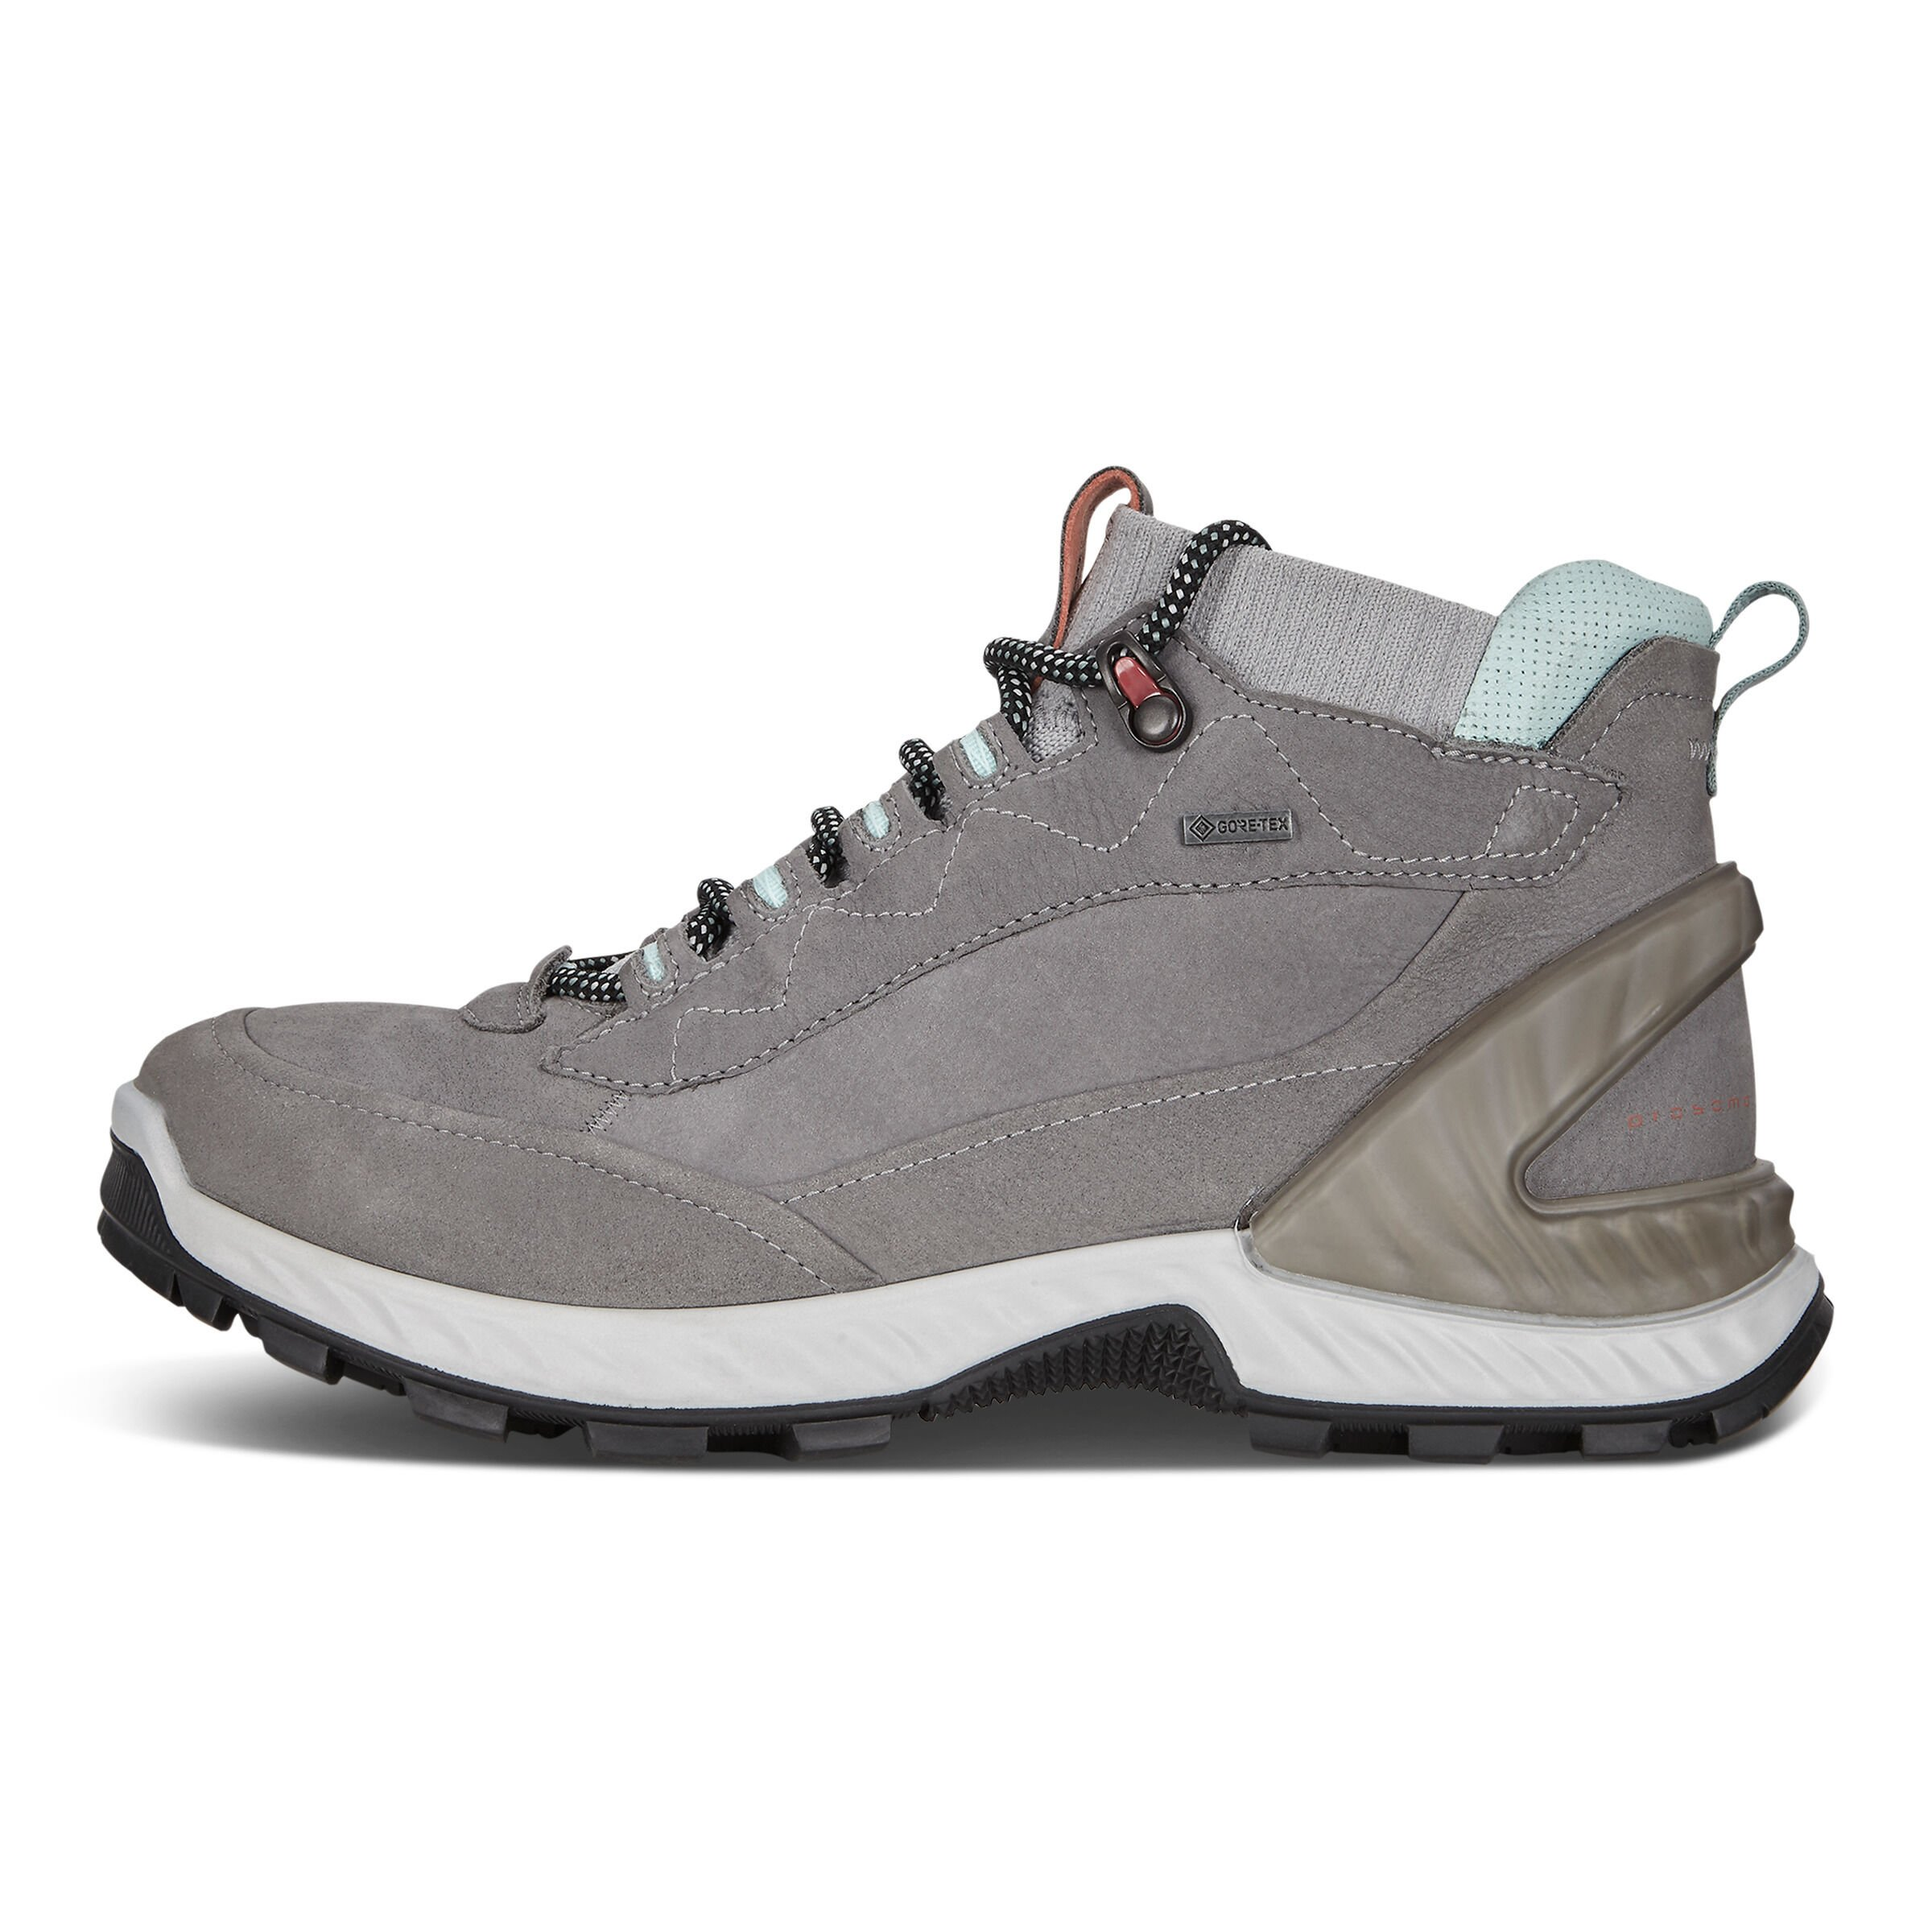 ECCO® Shoes, Boots, Sandals, Golf Shoes